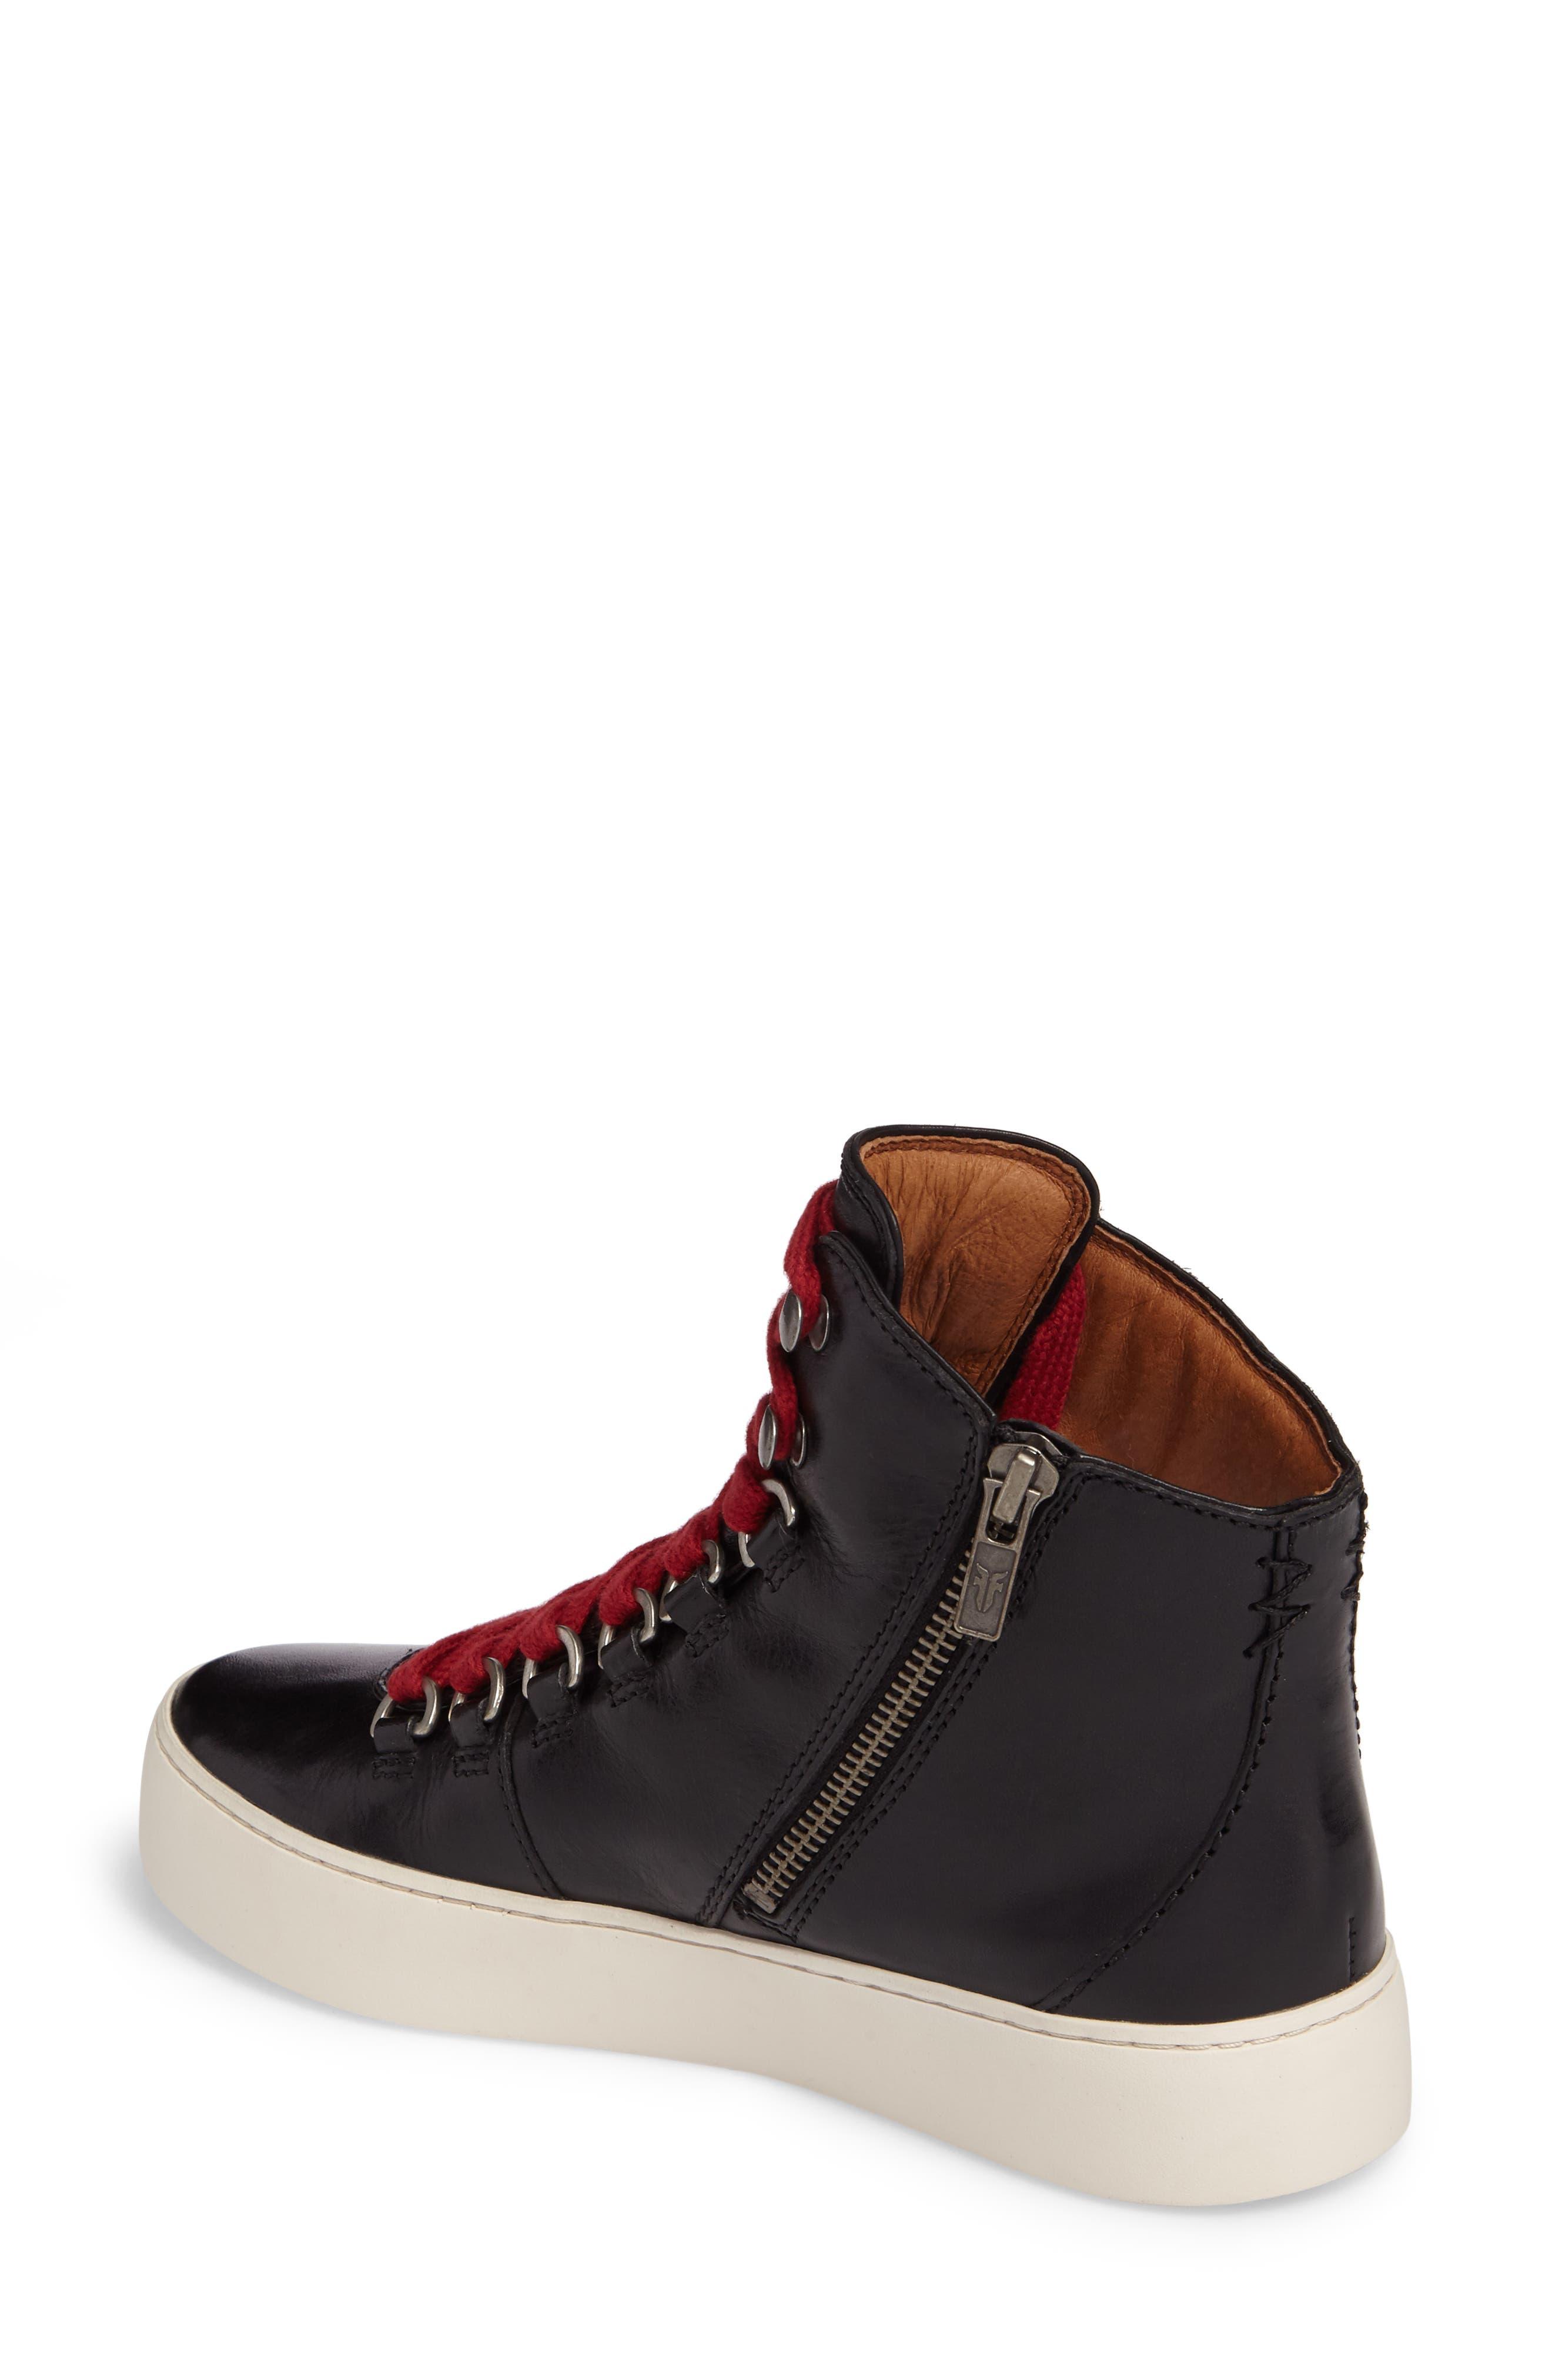 Lena Hiker High Top Sneaker,                             Alternate thumbnail 2, color,                             001